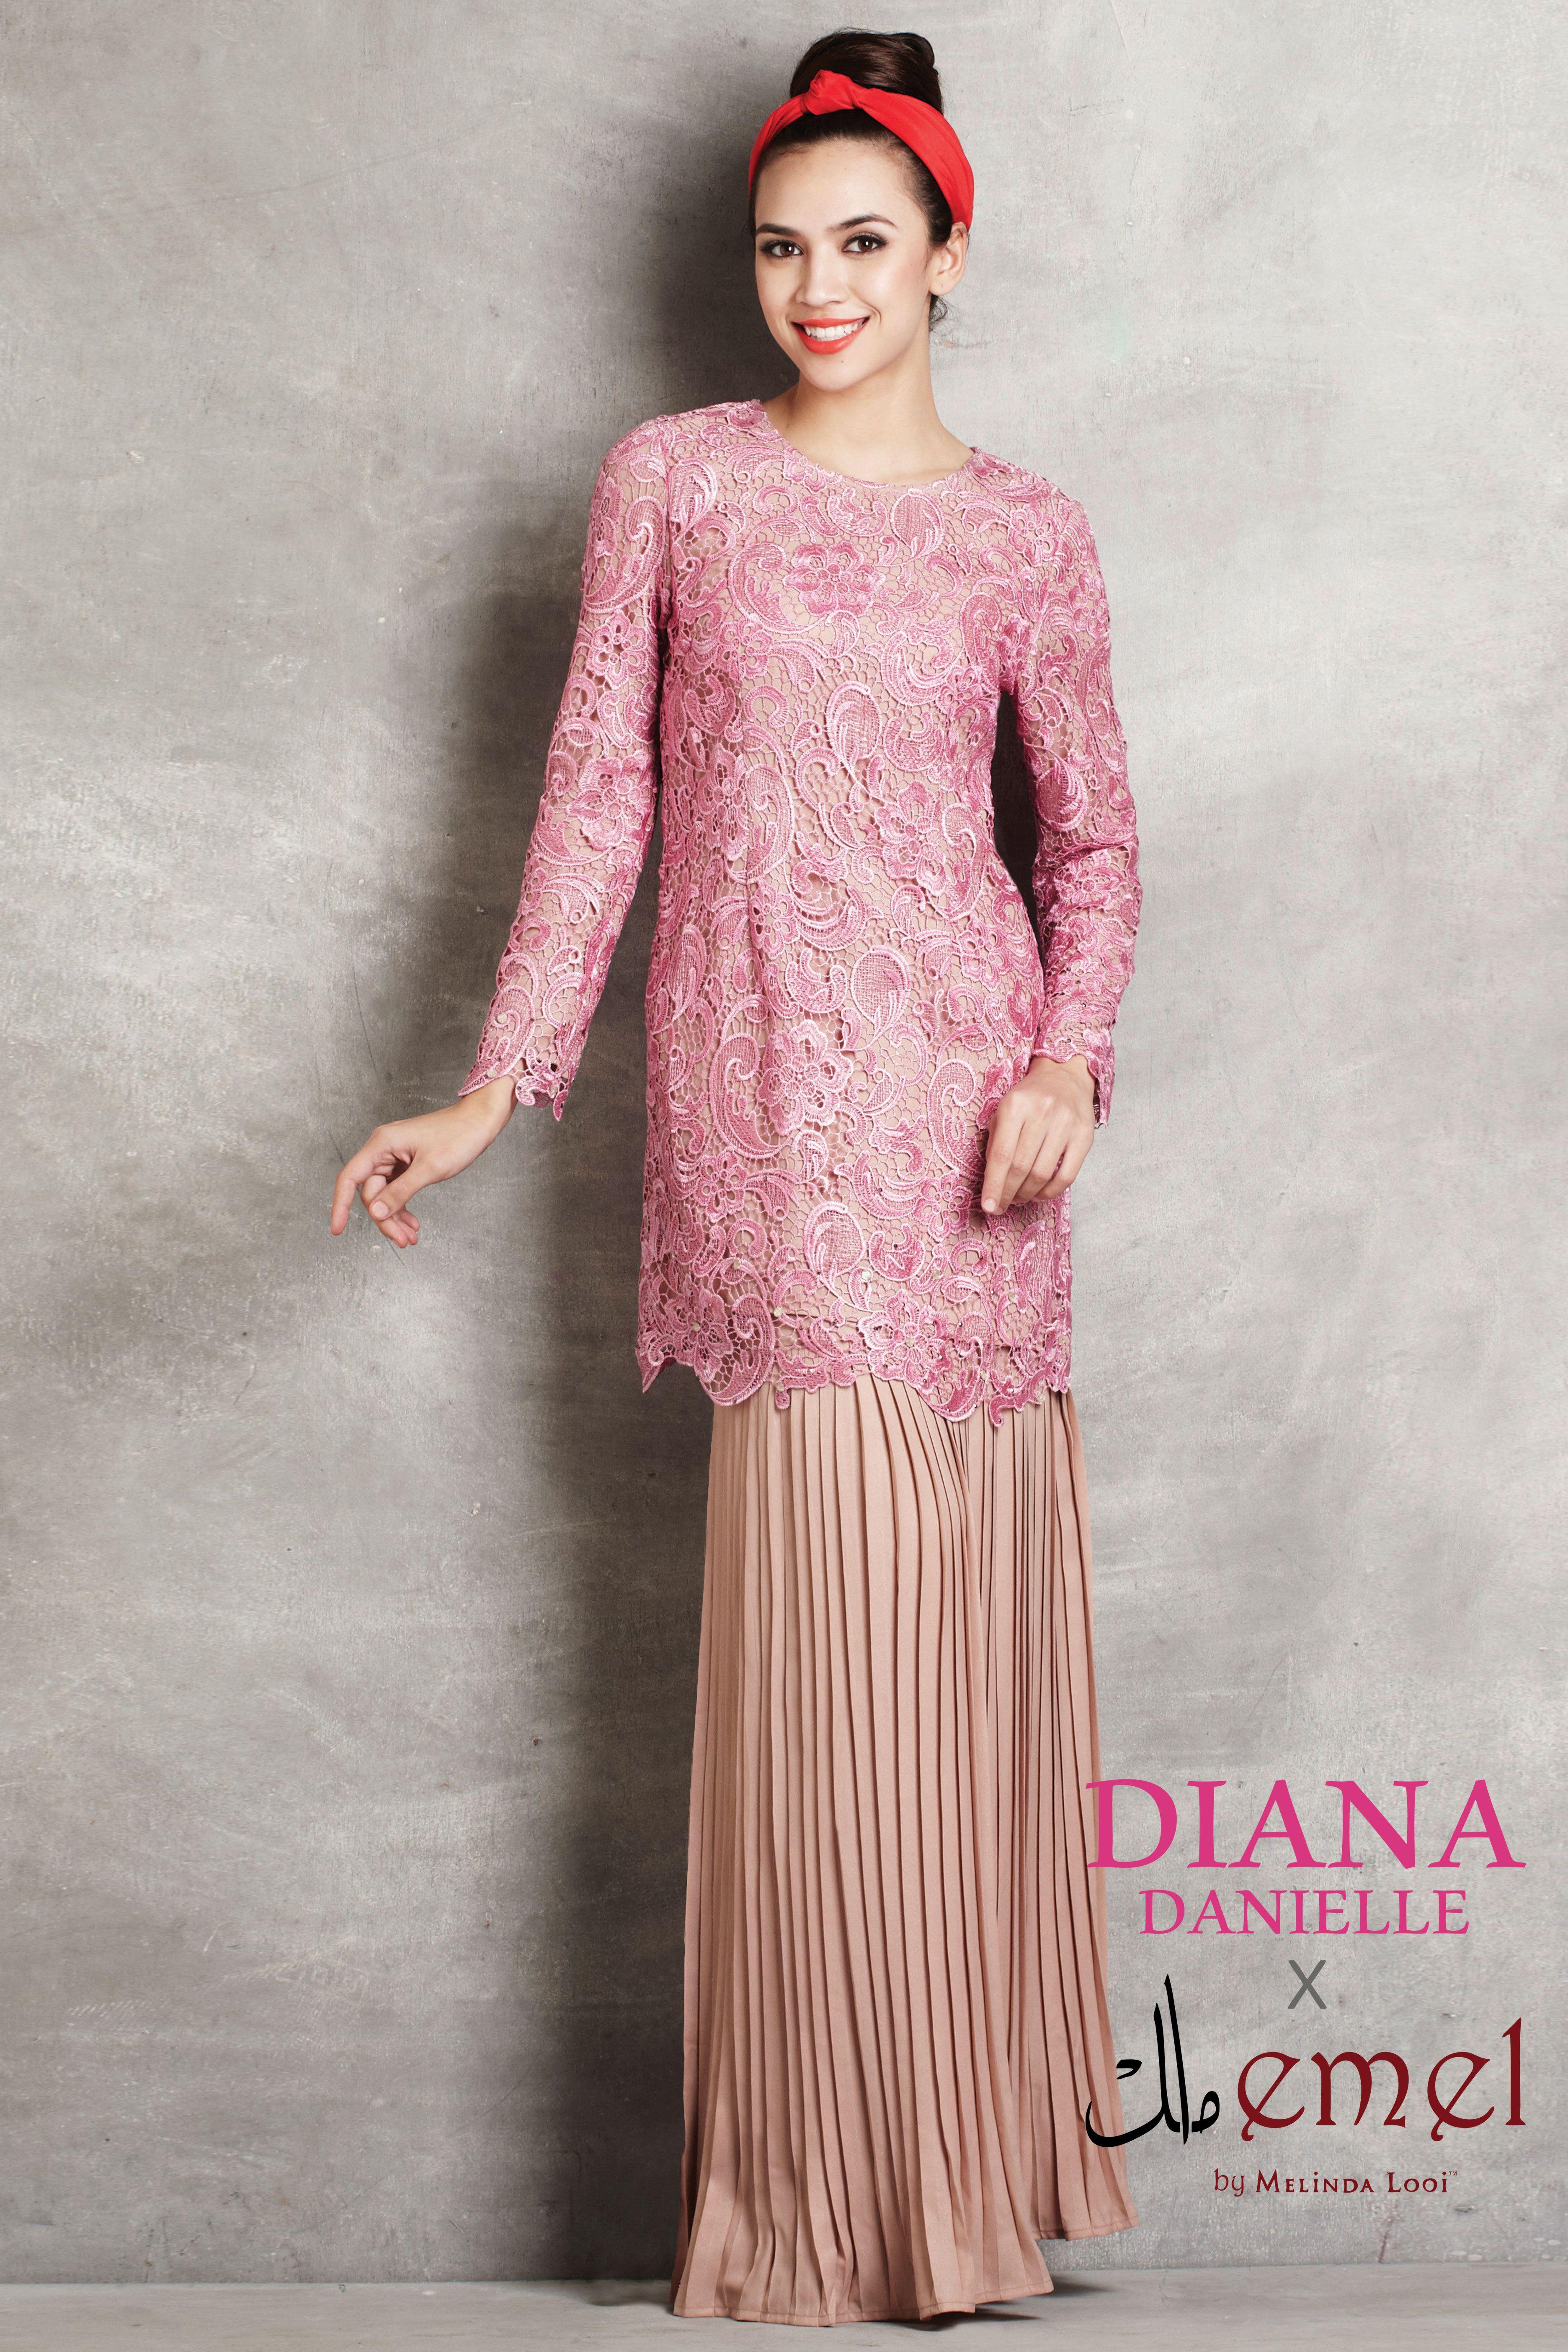 Emel X Diana Danielle 2014 Collection - Emel by Melinda Looi | Emel ...